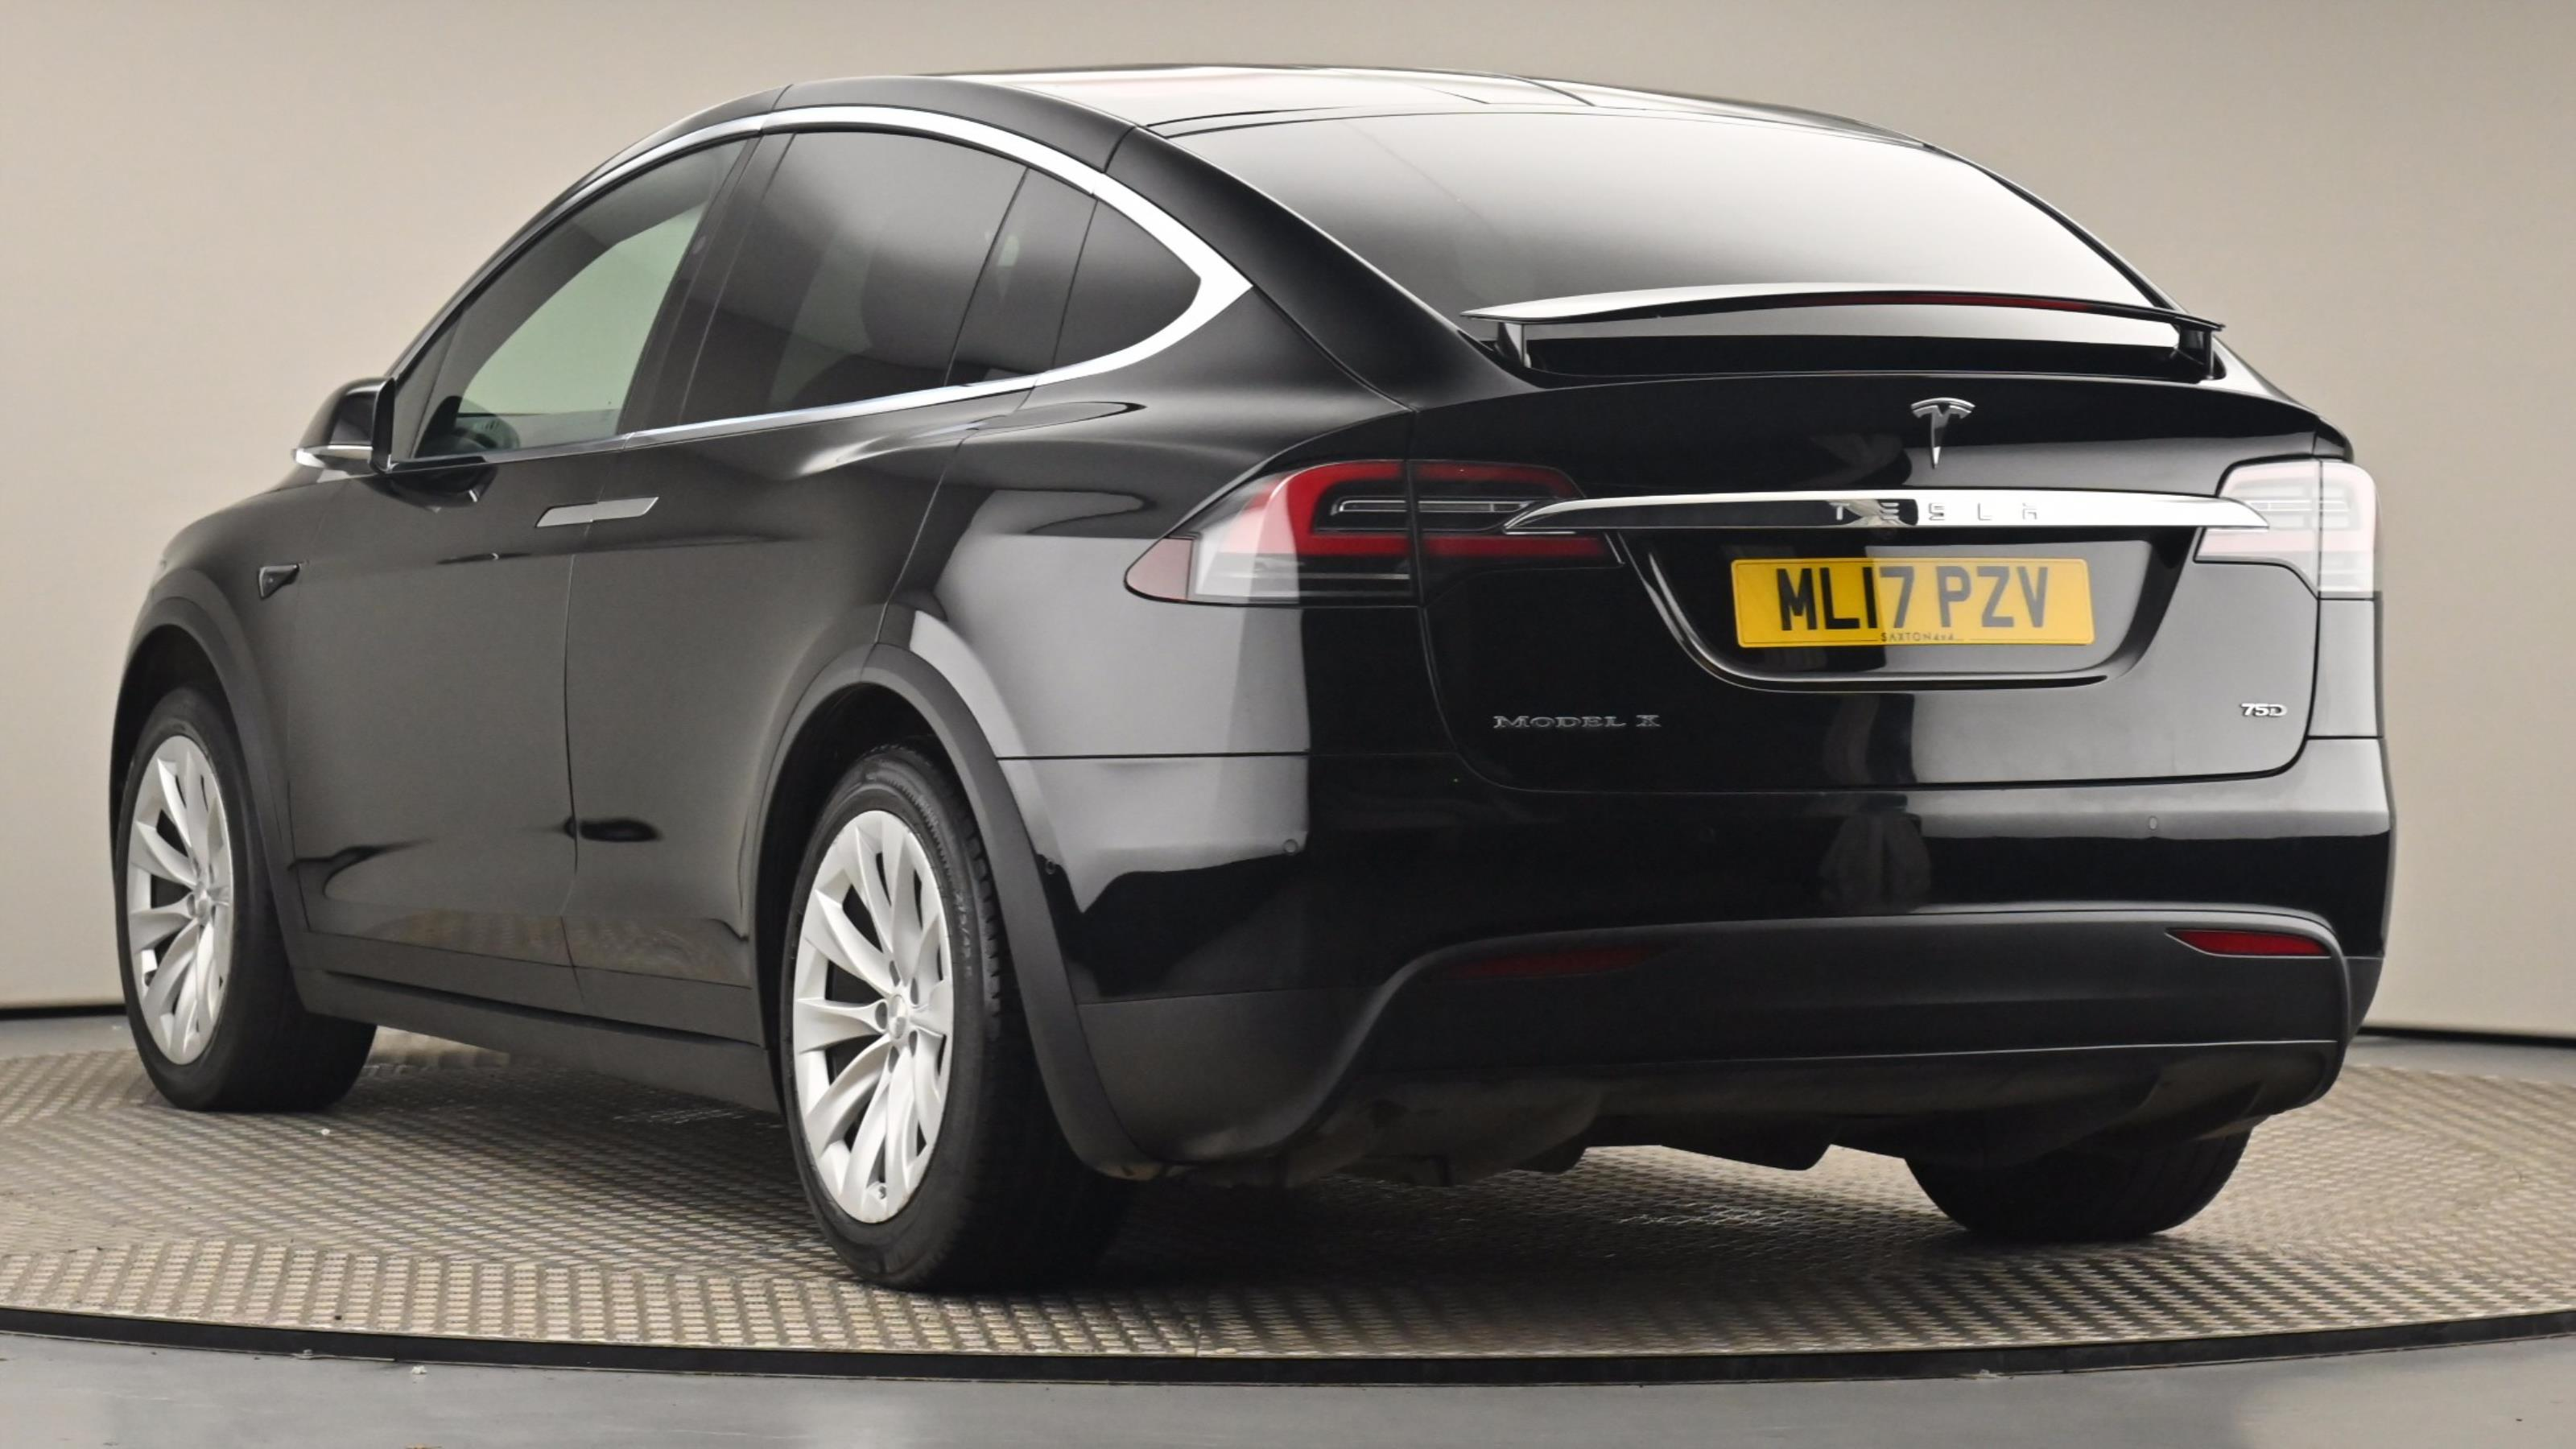 Used 2017 Tesla MODEL S 315kW 90kWh Dual Motor 5dr [Nav] BLACK at Saxton4x4